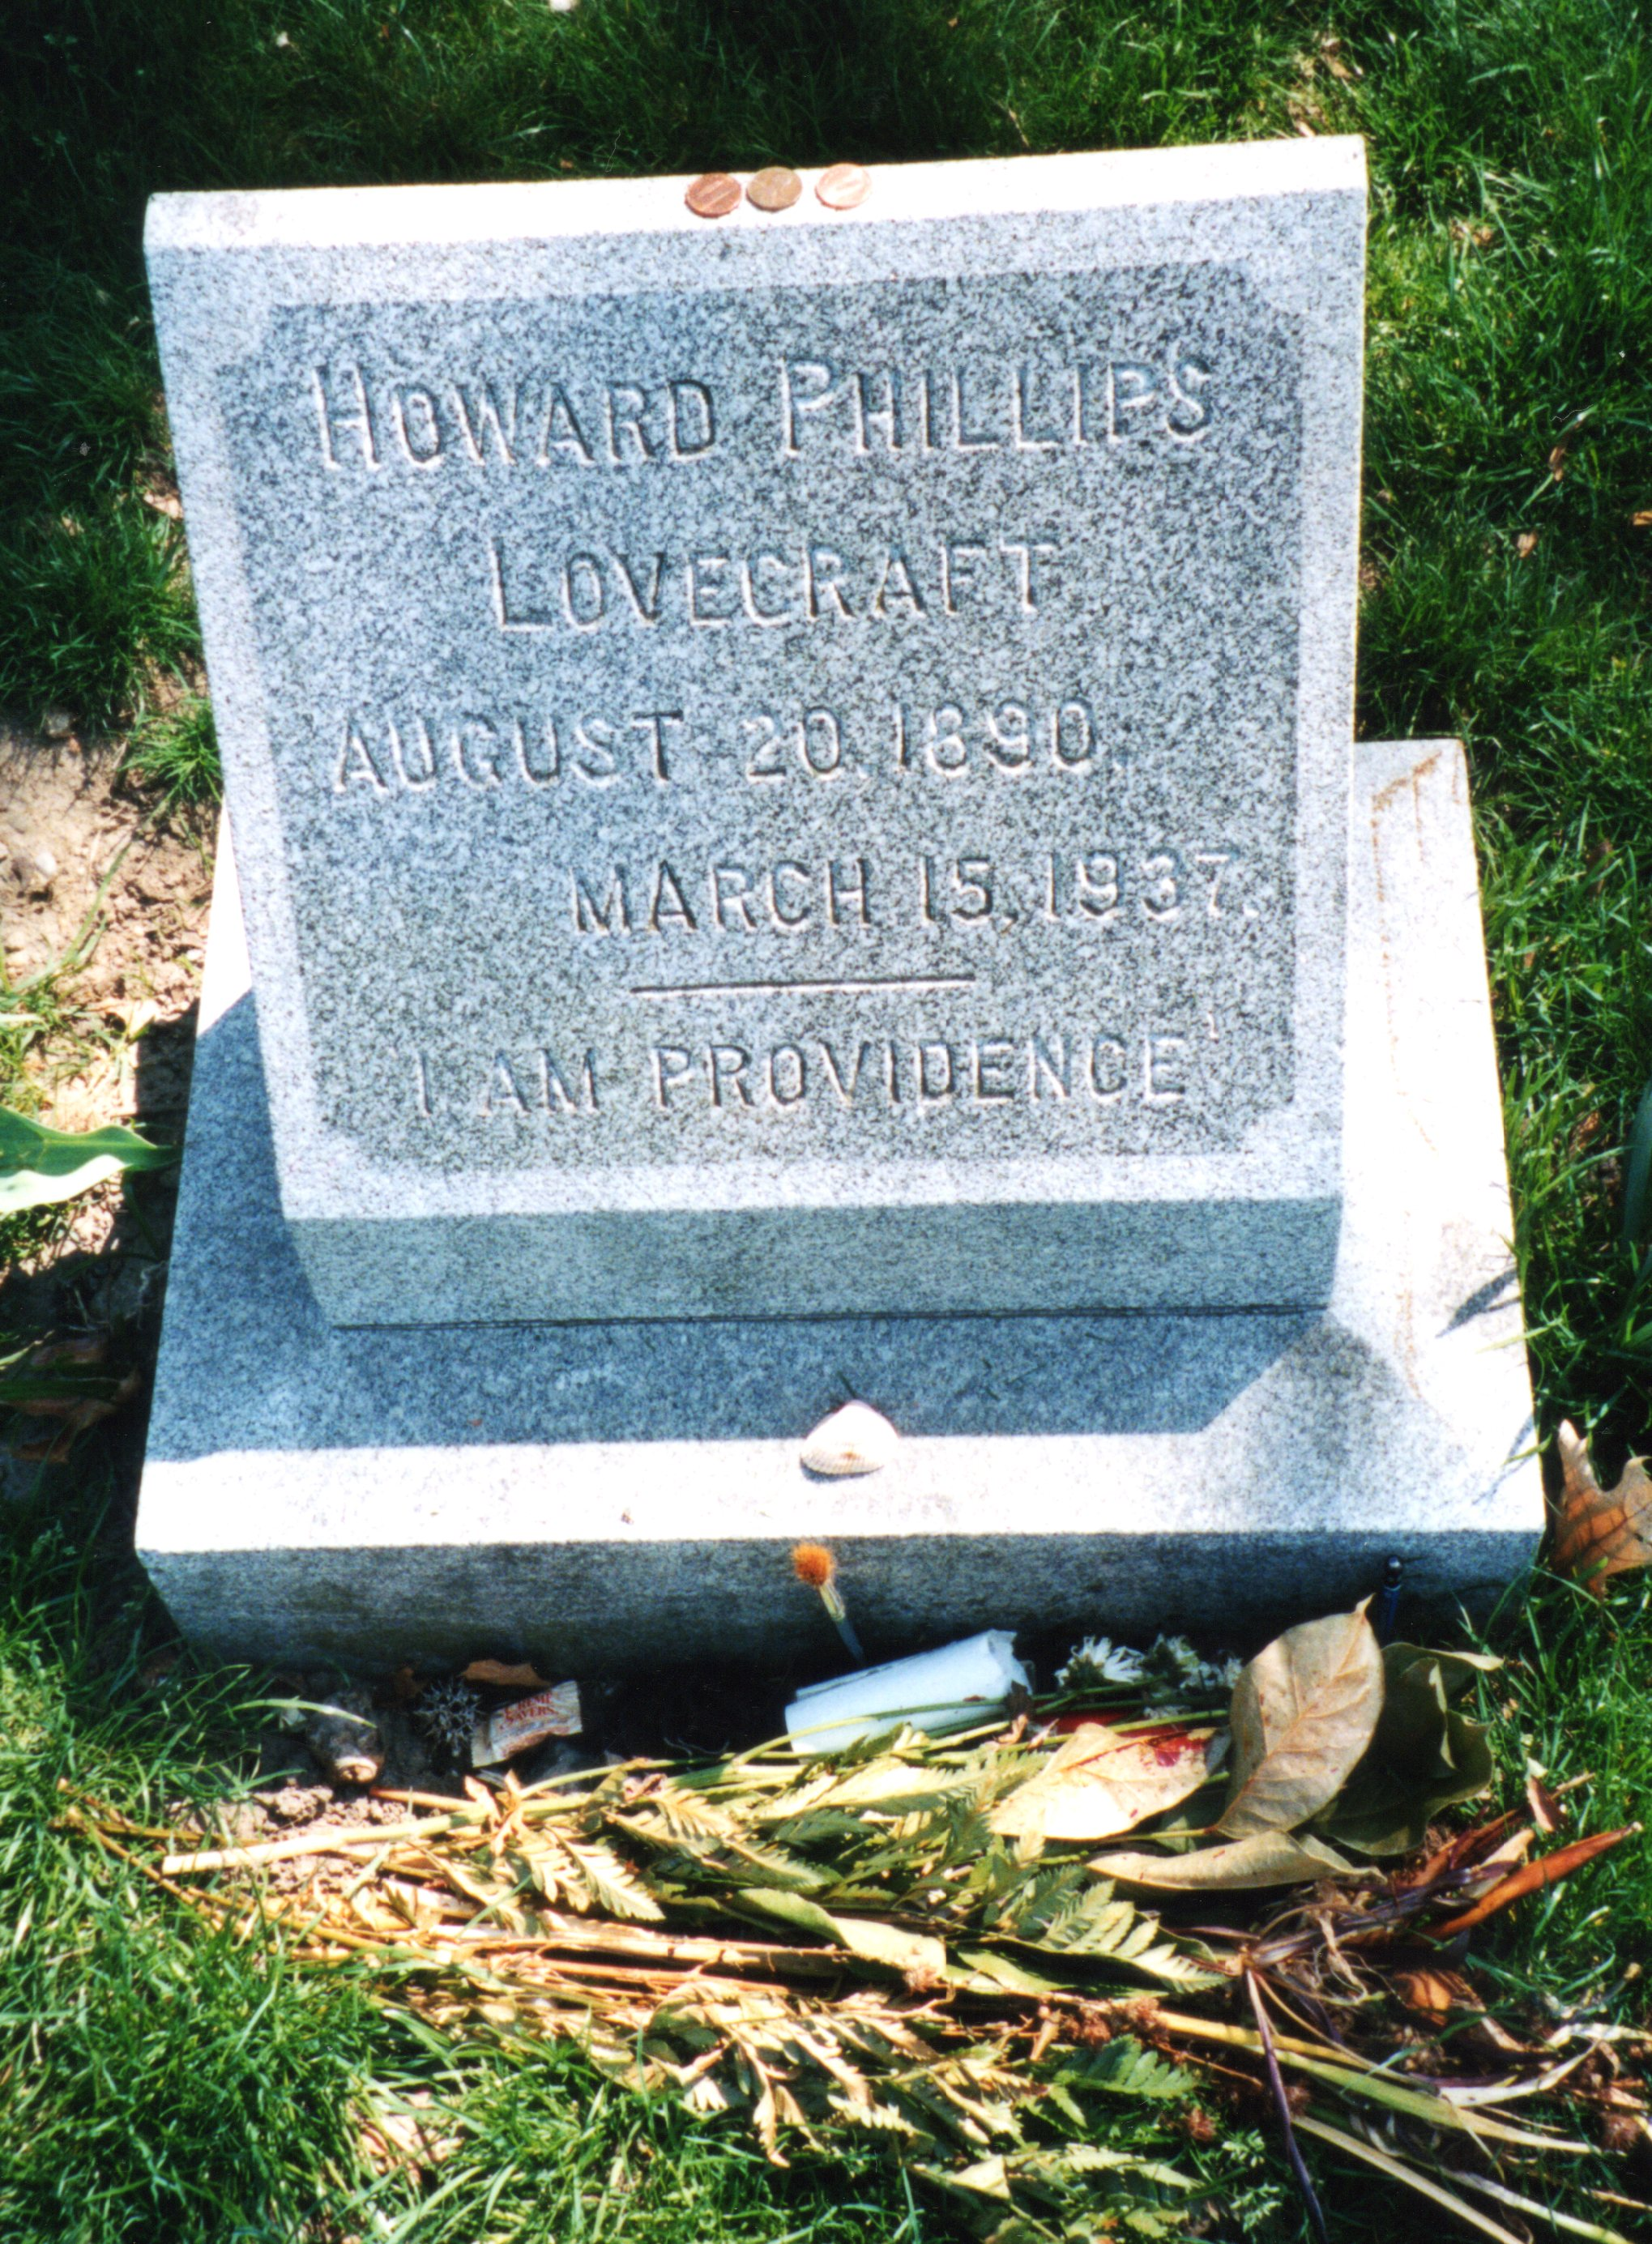 H. P. Lovecraft's grave in Providence (via Cemetery Travel)